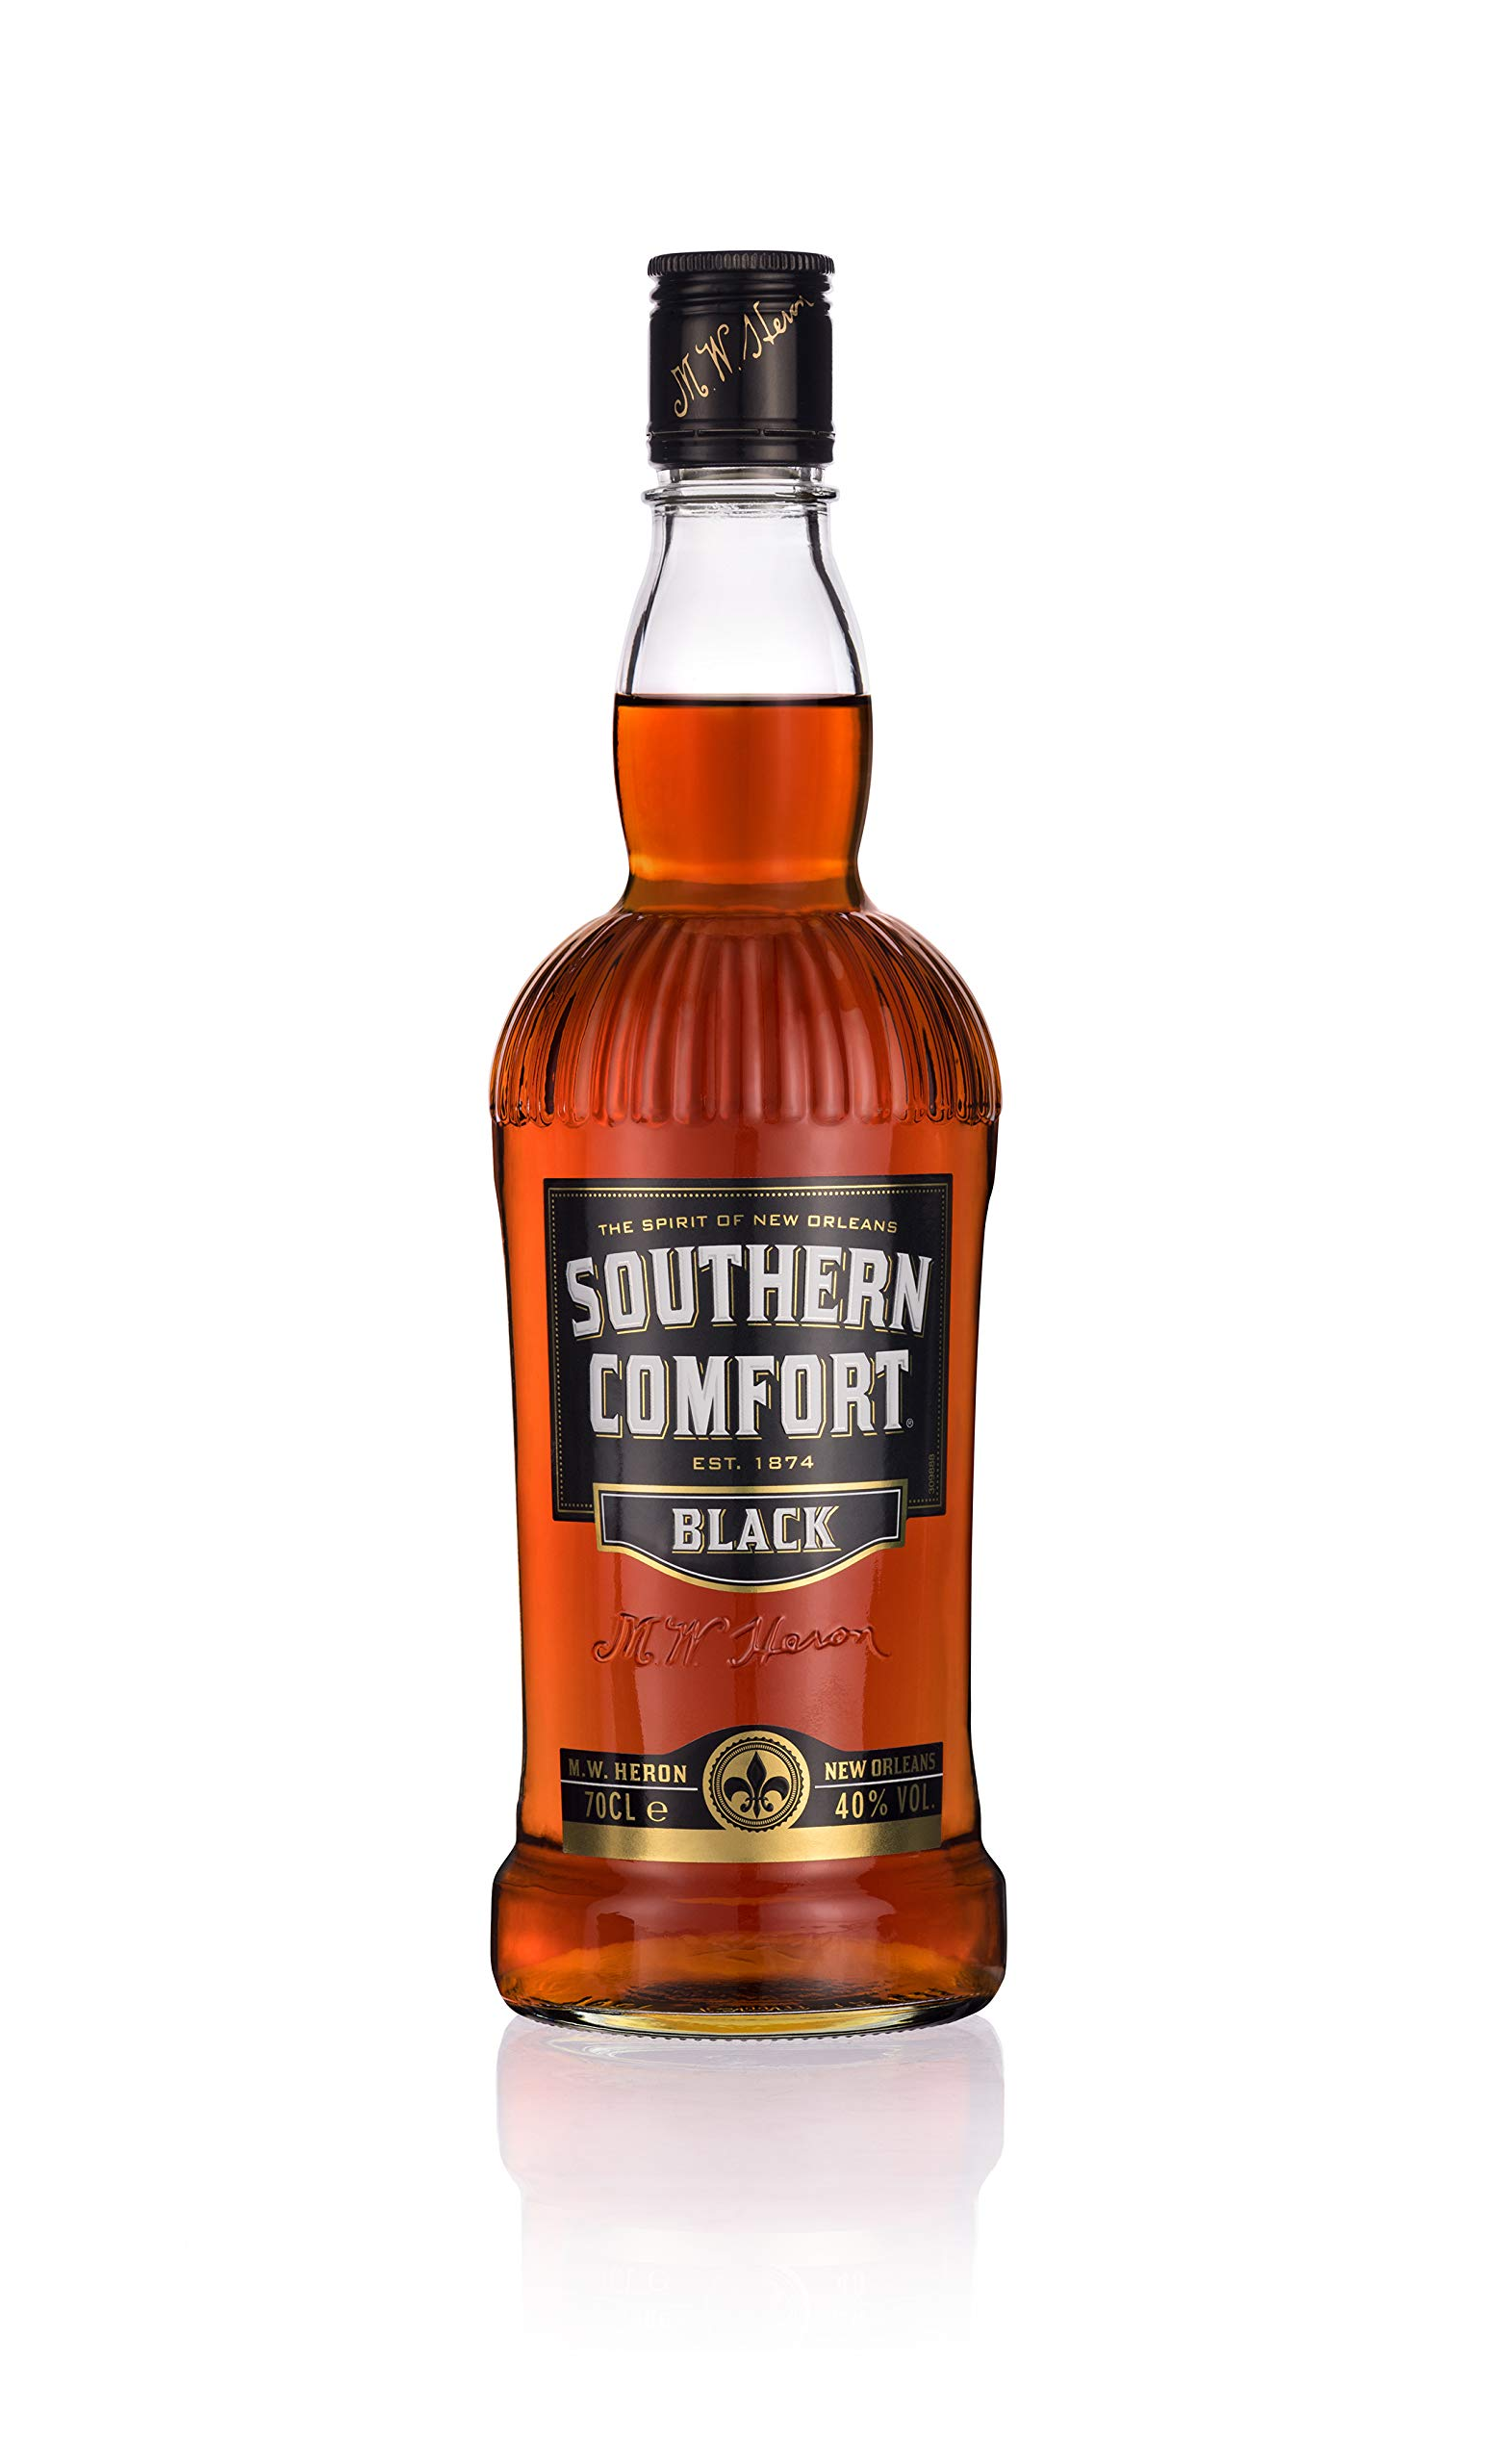 Southern-Comfort-Black-Whisky-1-x-07-l